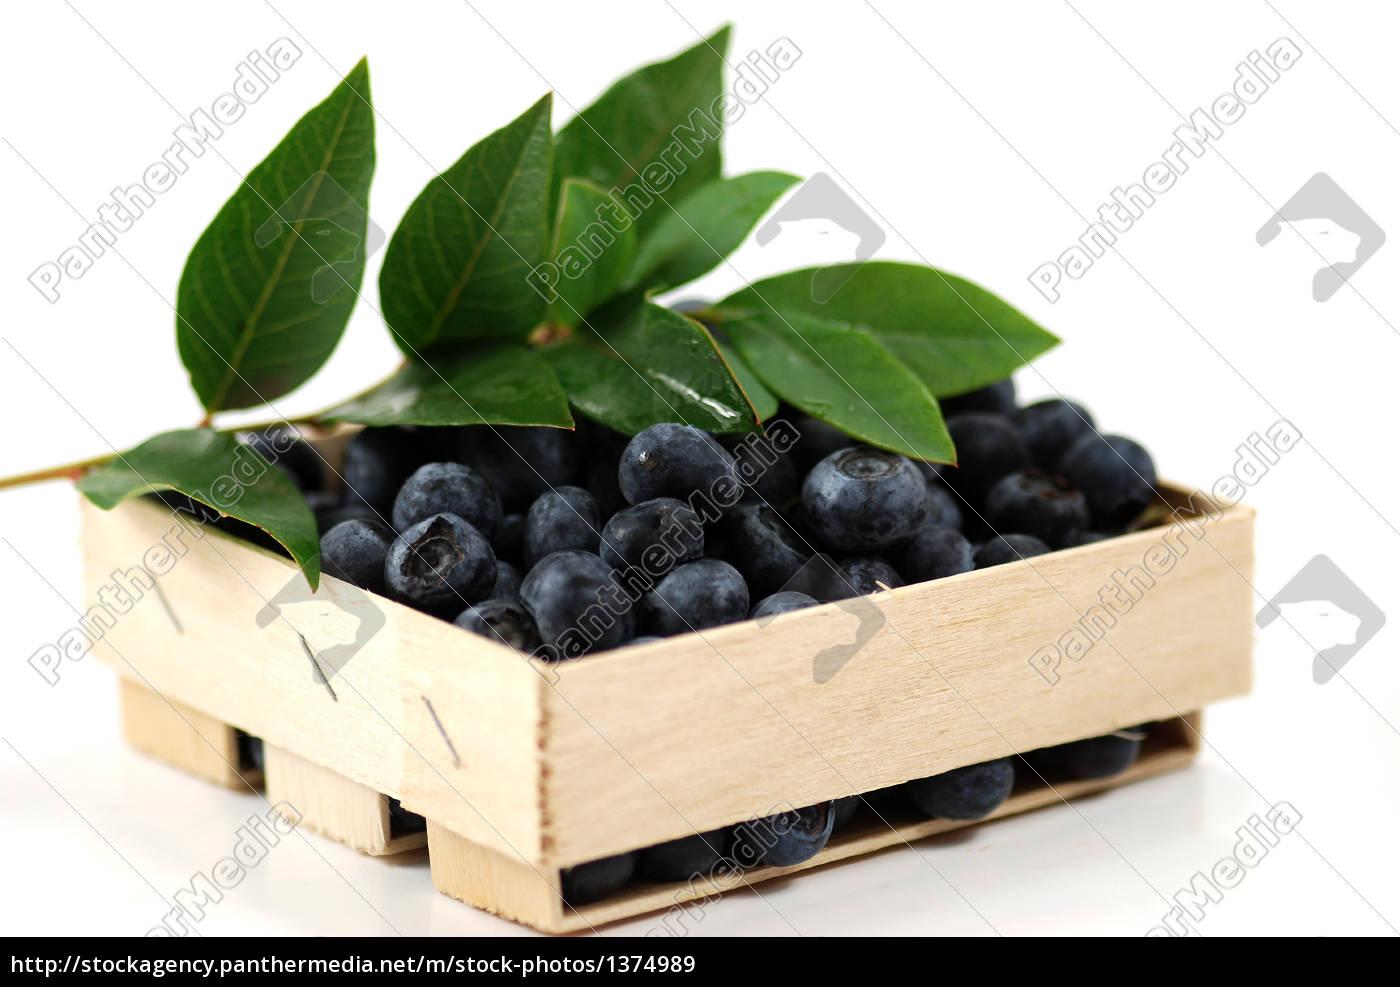 blueberries - 1374989